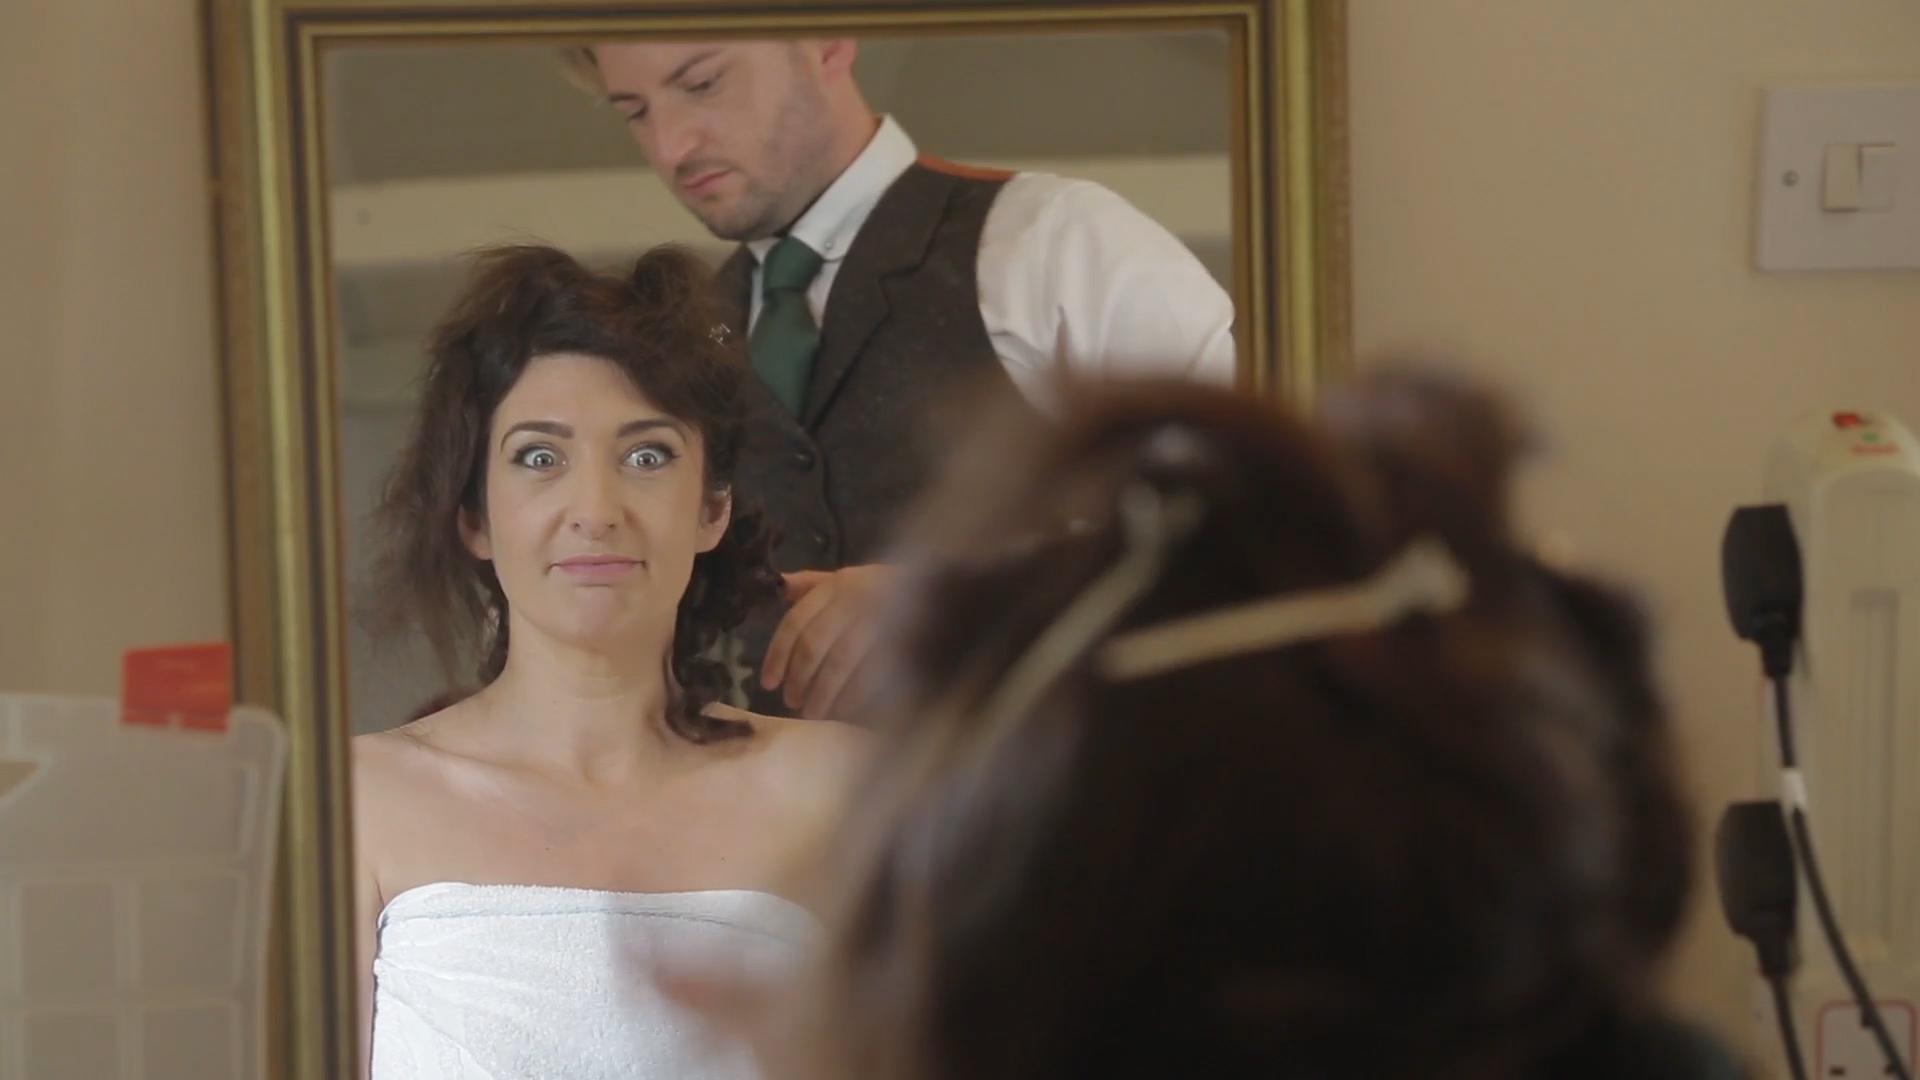 marryoke-hair-bride-mirror-wedding-videography-norfolk